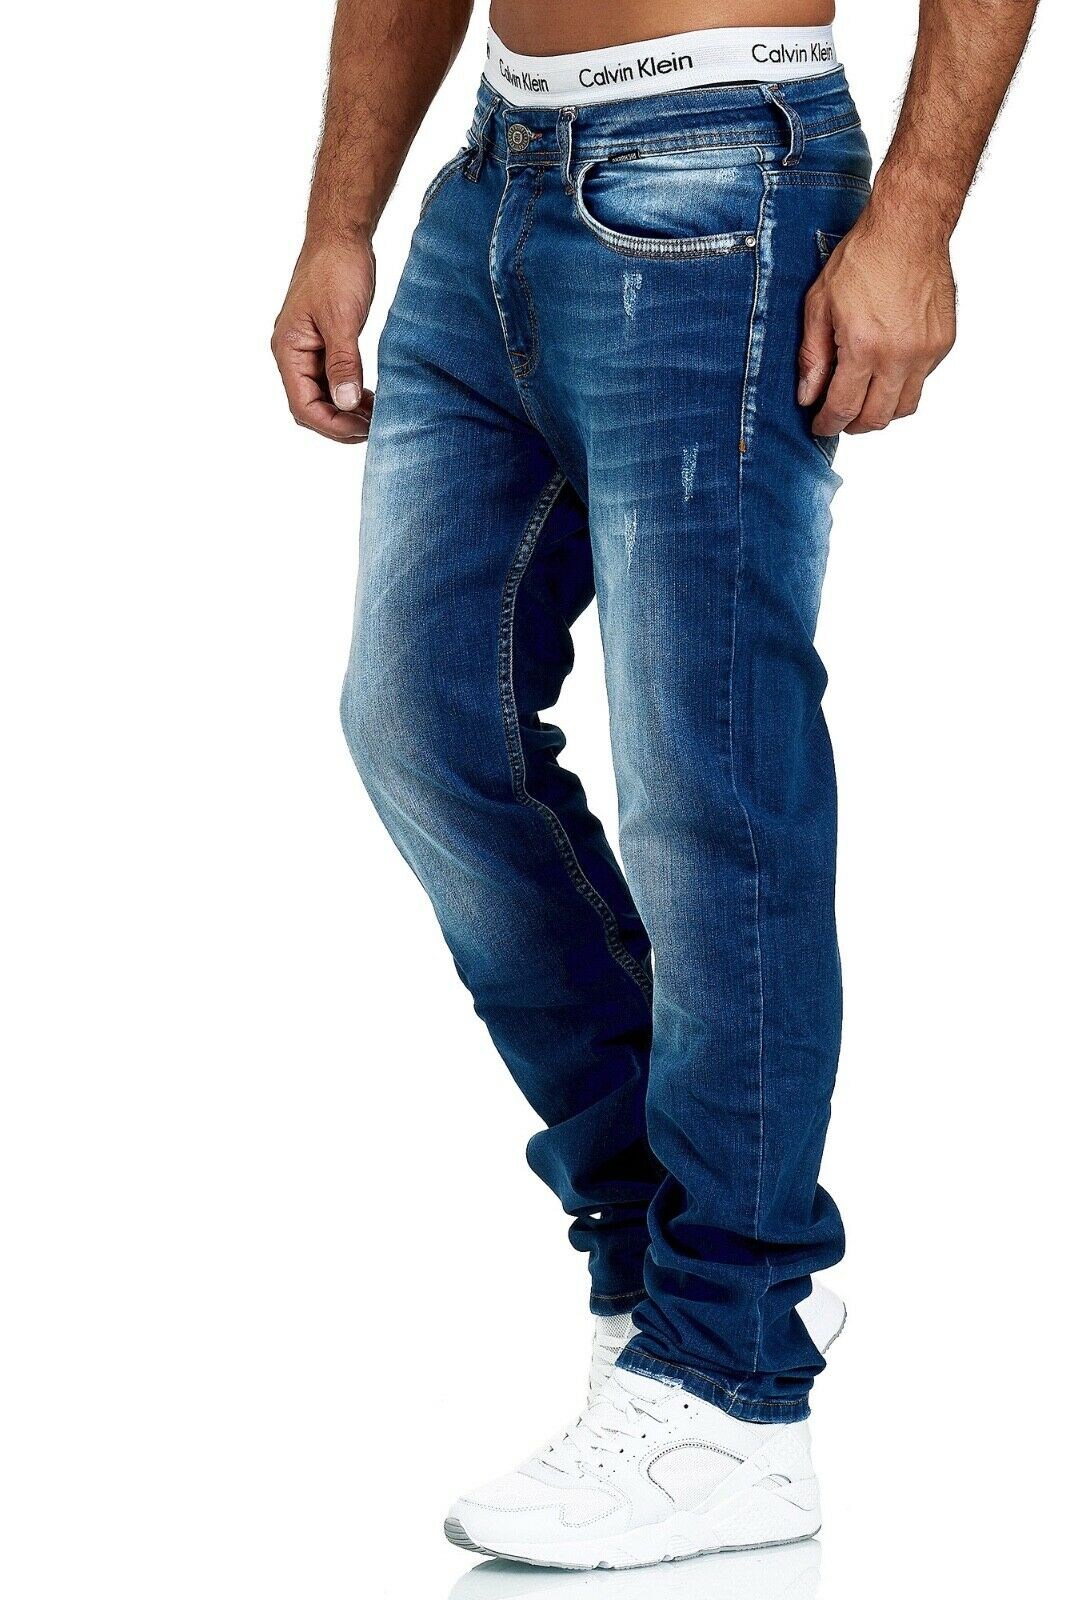 Herren-Jeans-Hose-Denim-KC-Black-Washed-Straight-Cut-Regular-Dicke-Naht-naehte Indexbild 37